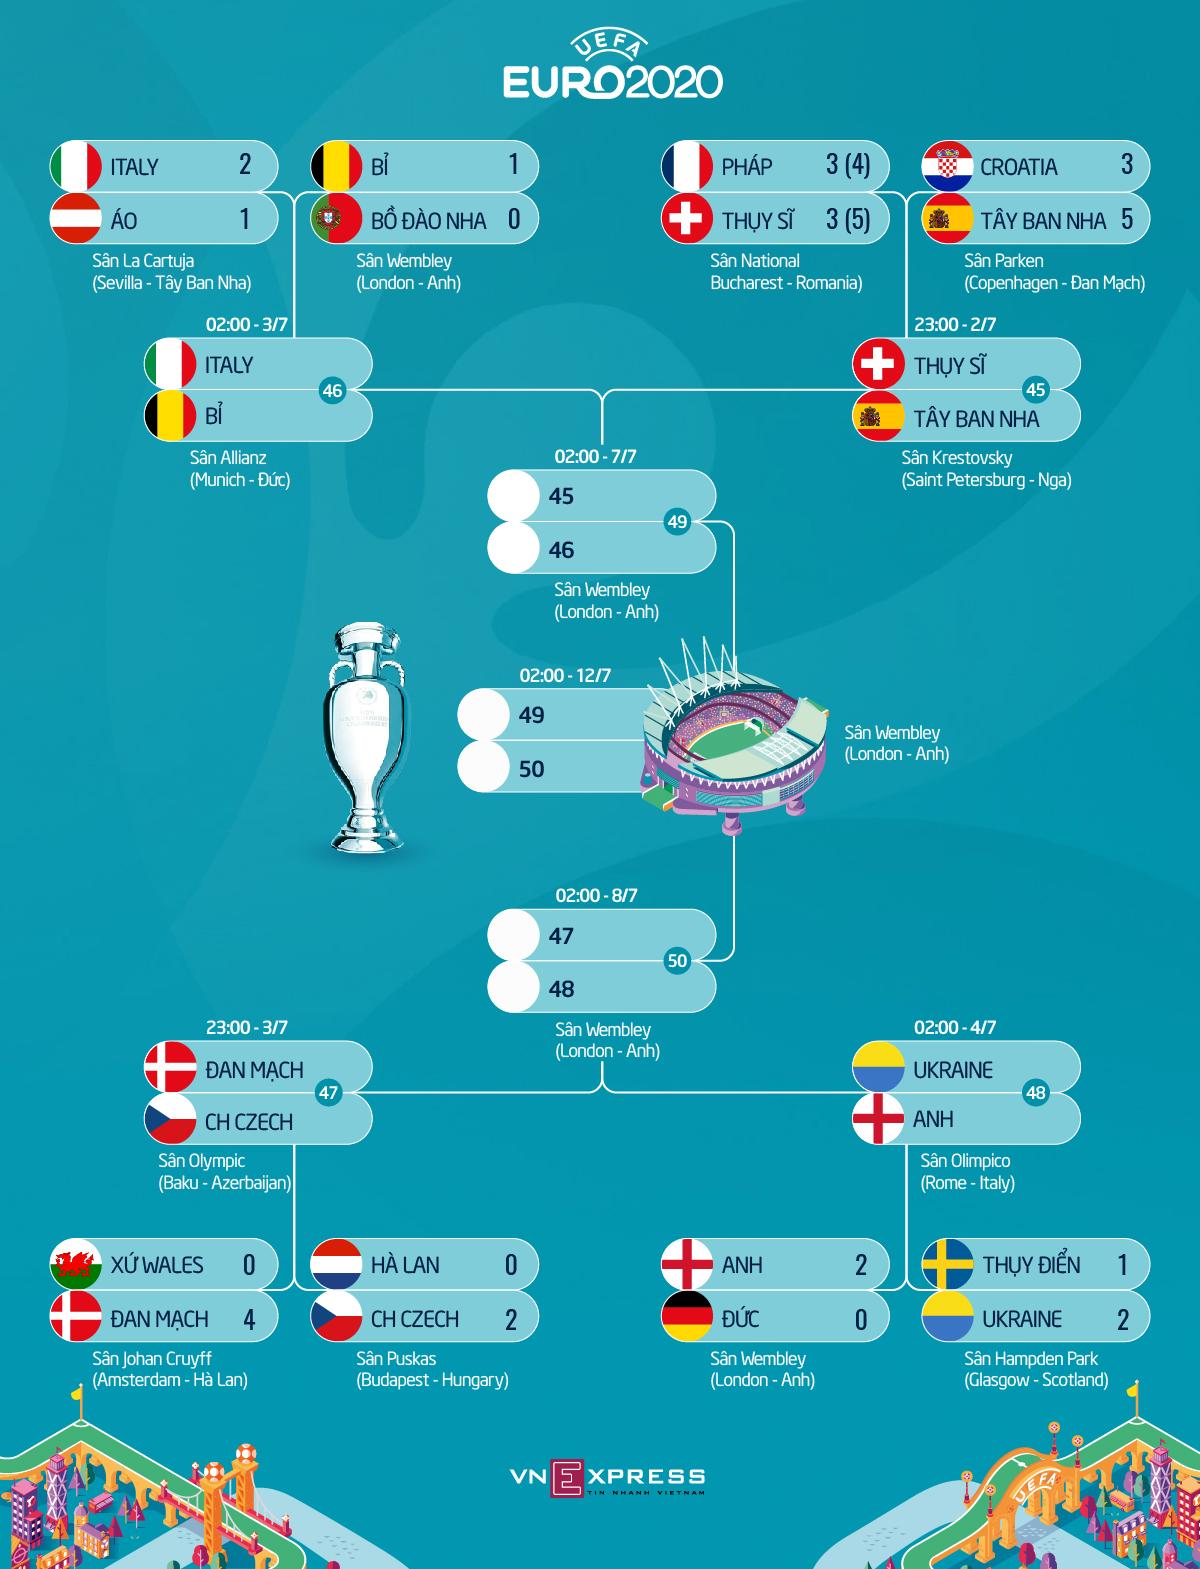 Jorginho: Italy biết điểm yếu của Bỉ